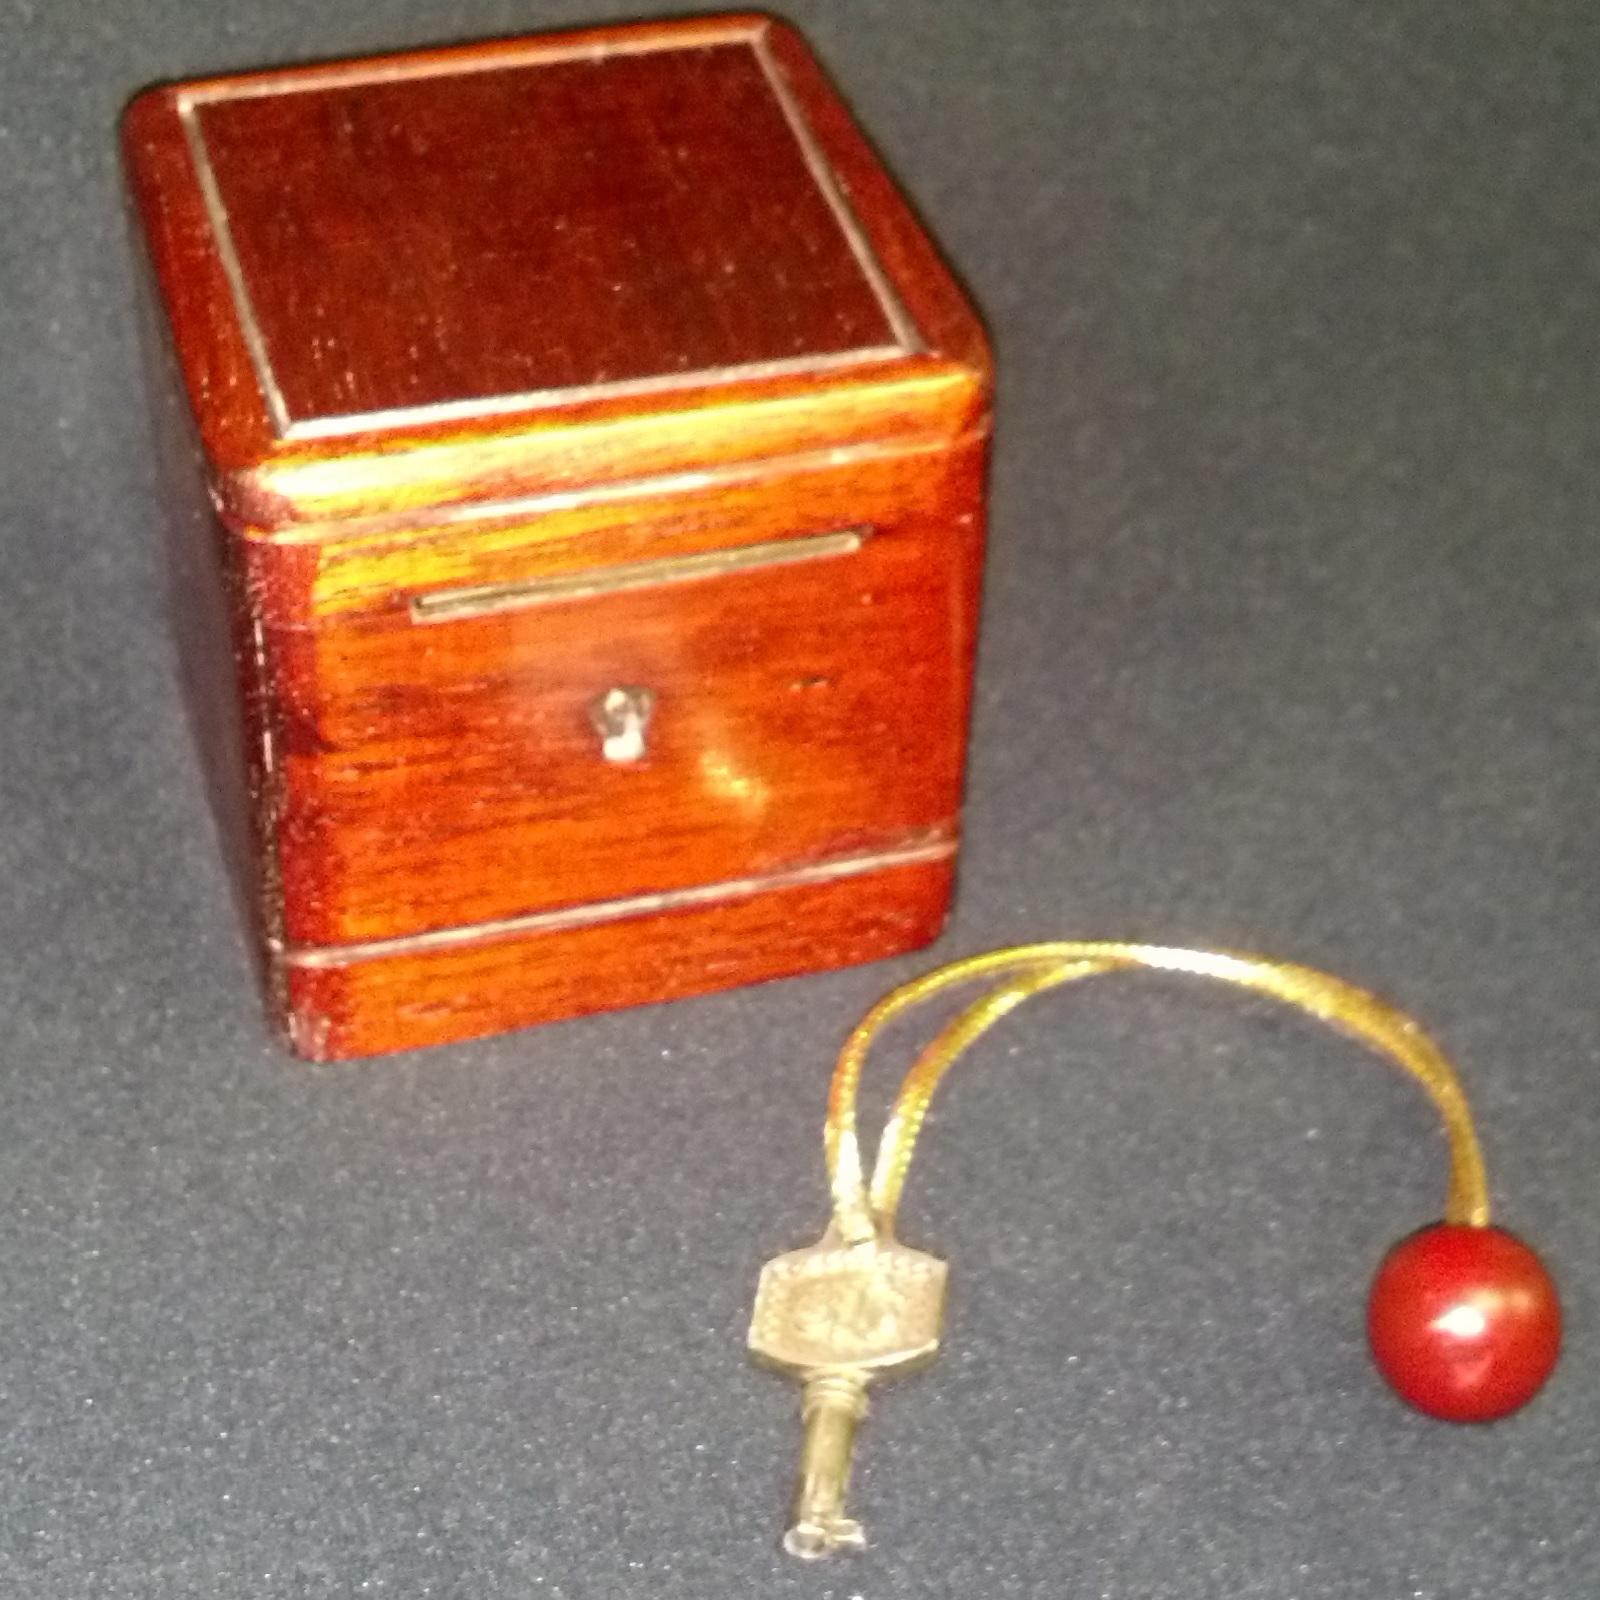 Ring-A-Ling Box by Bob Kline